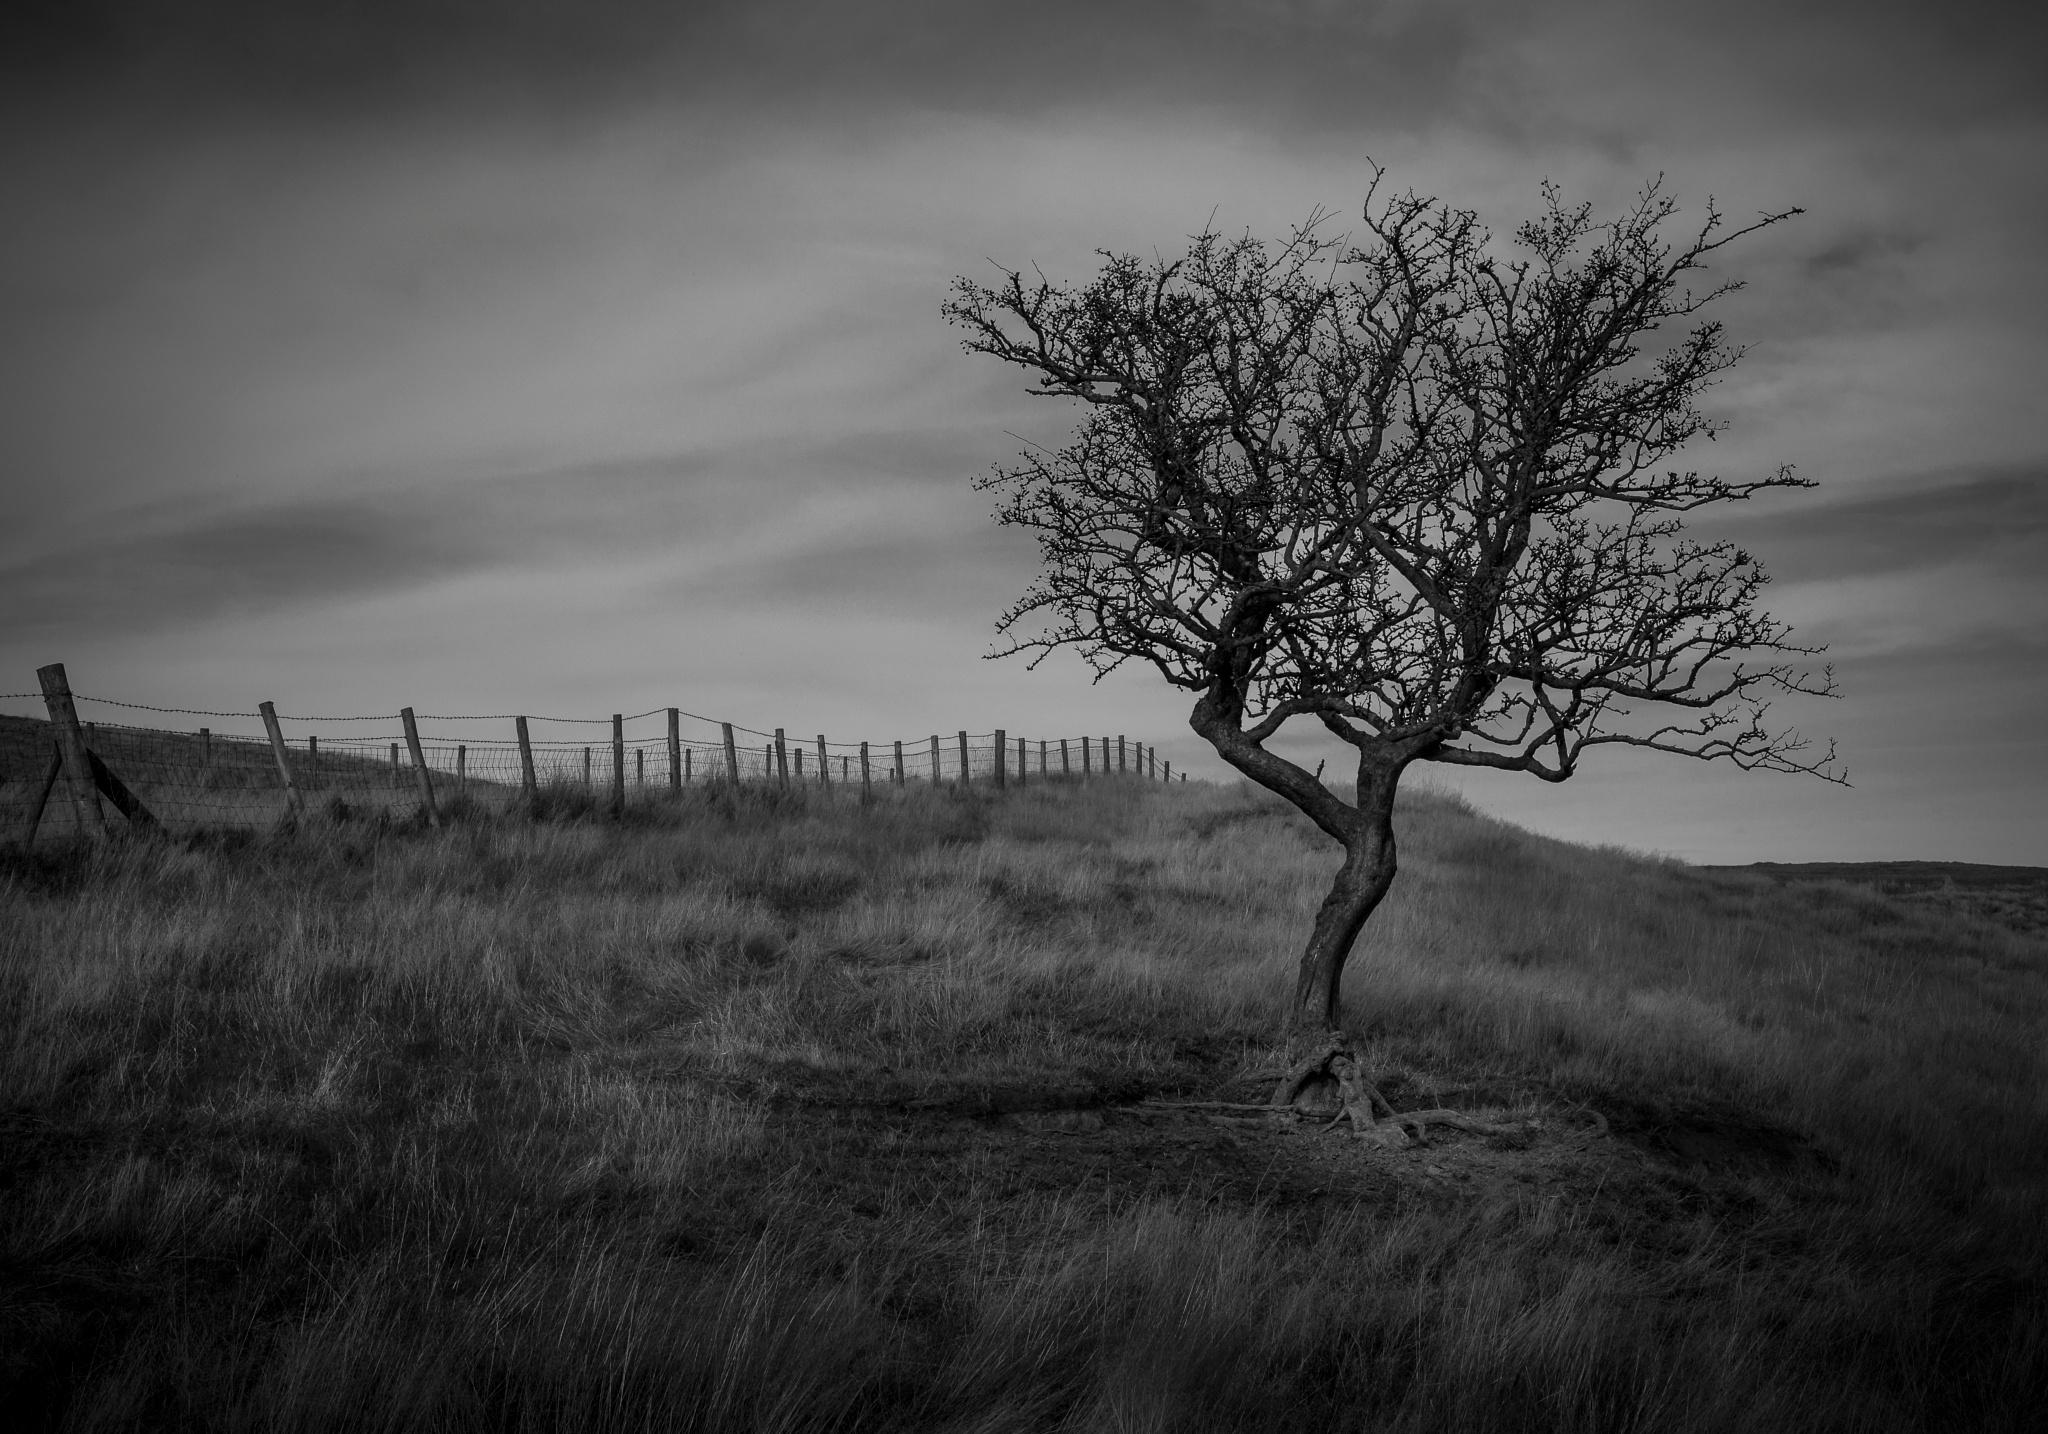 Alone on Roseberry by BradShaw